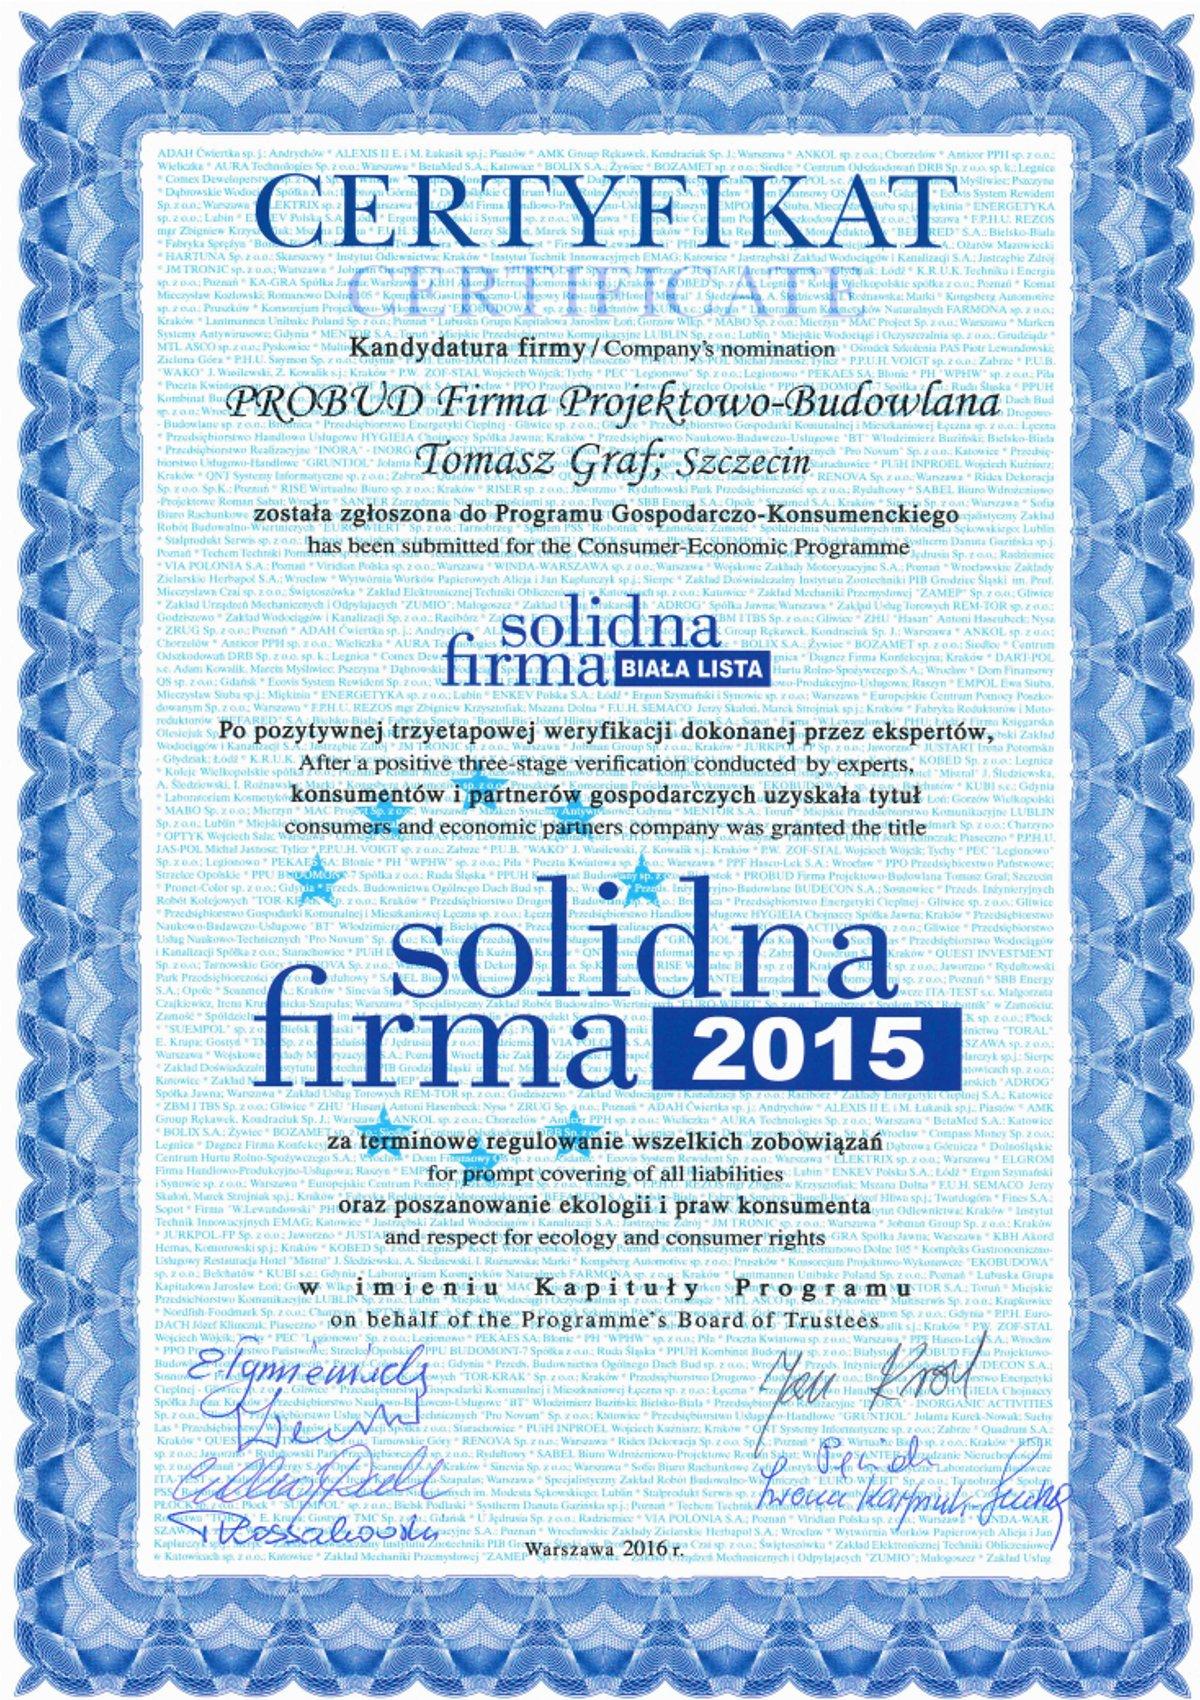 Certyfikat Solidna Firma 2015